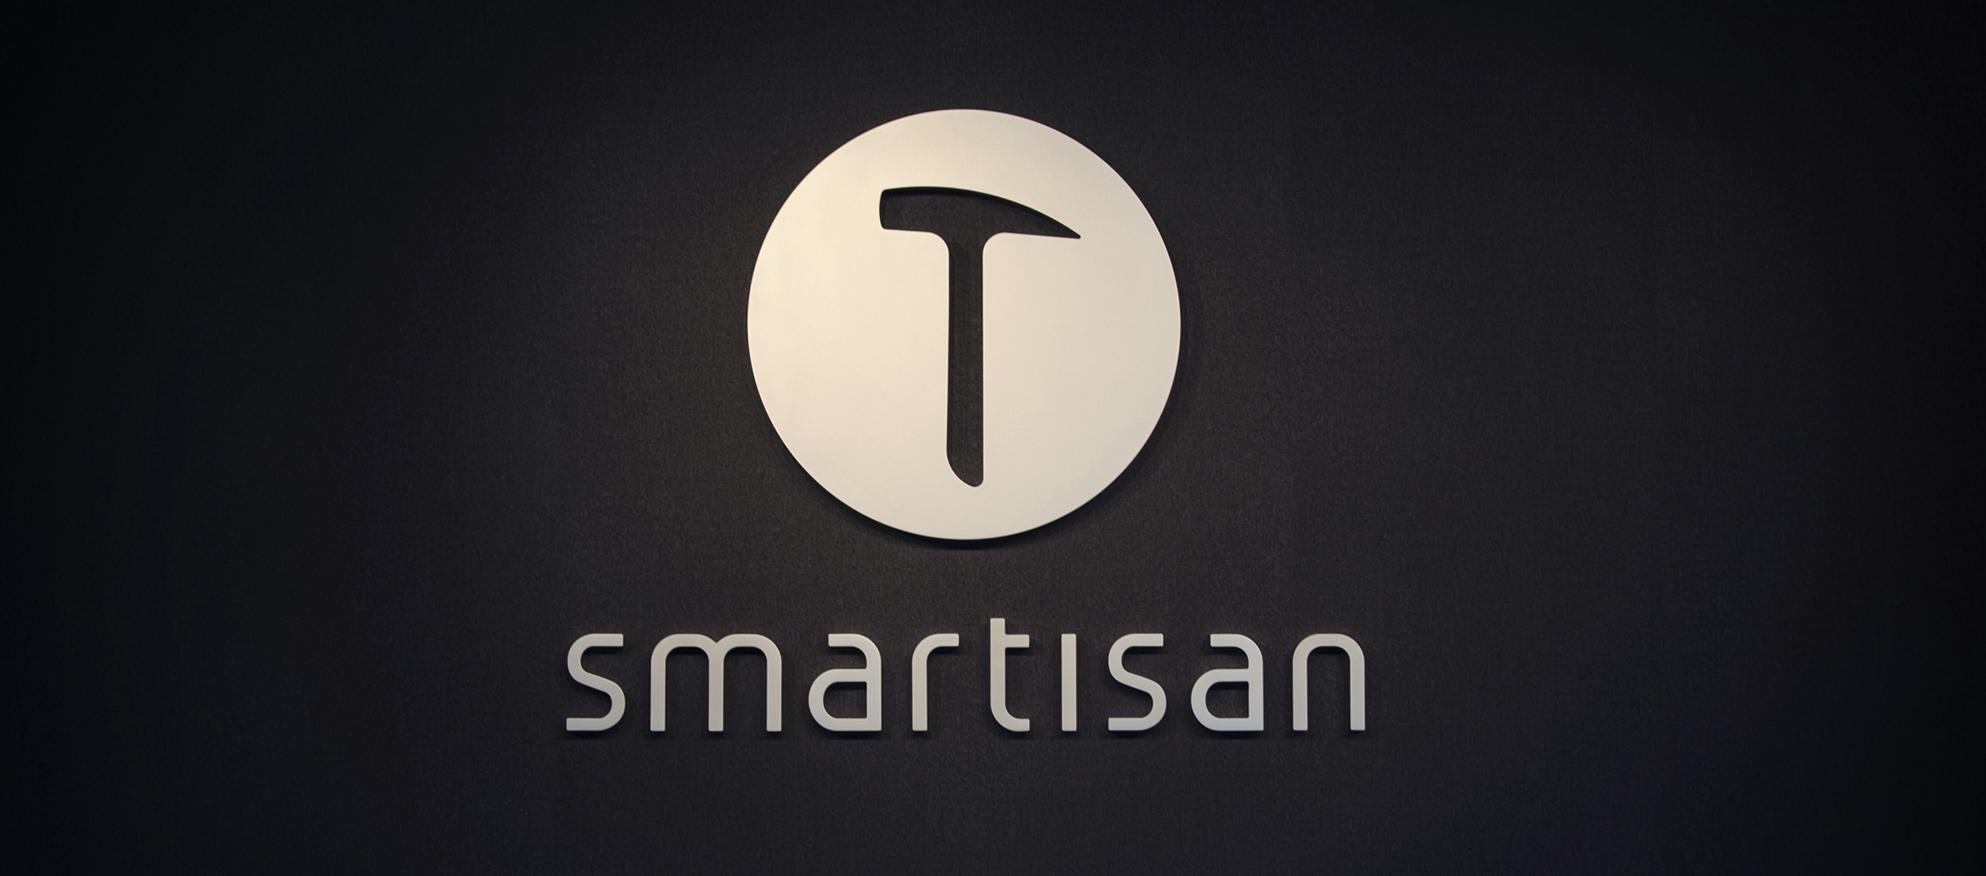 为何Android 5.1对Smartisan T1的提升会很小?